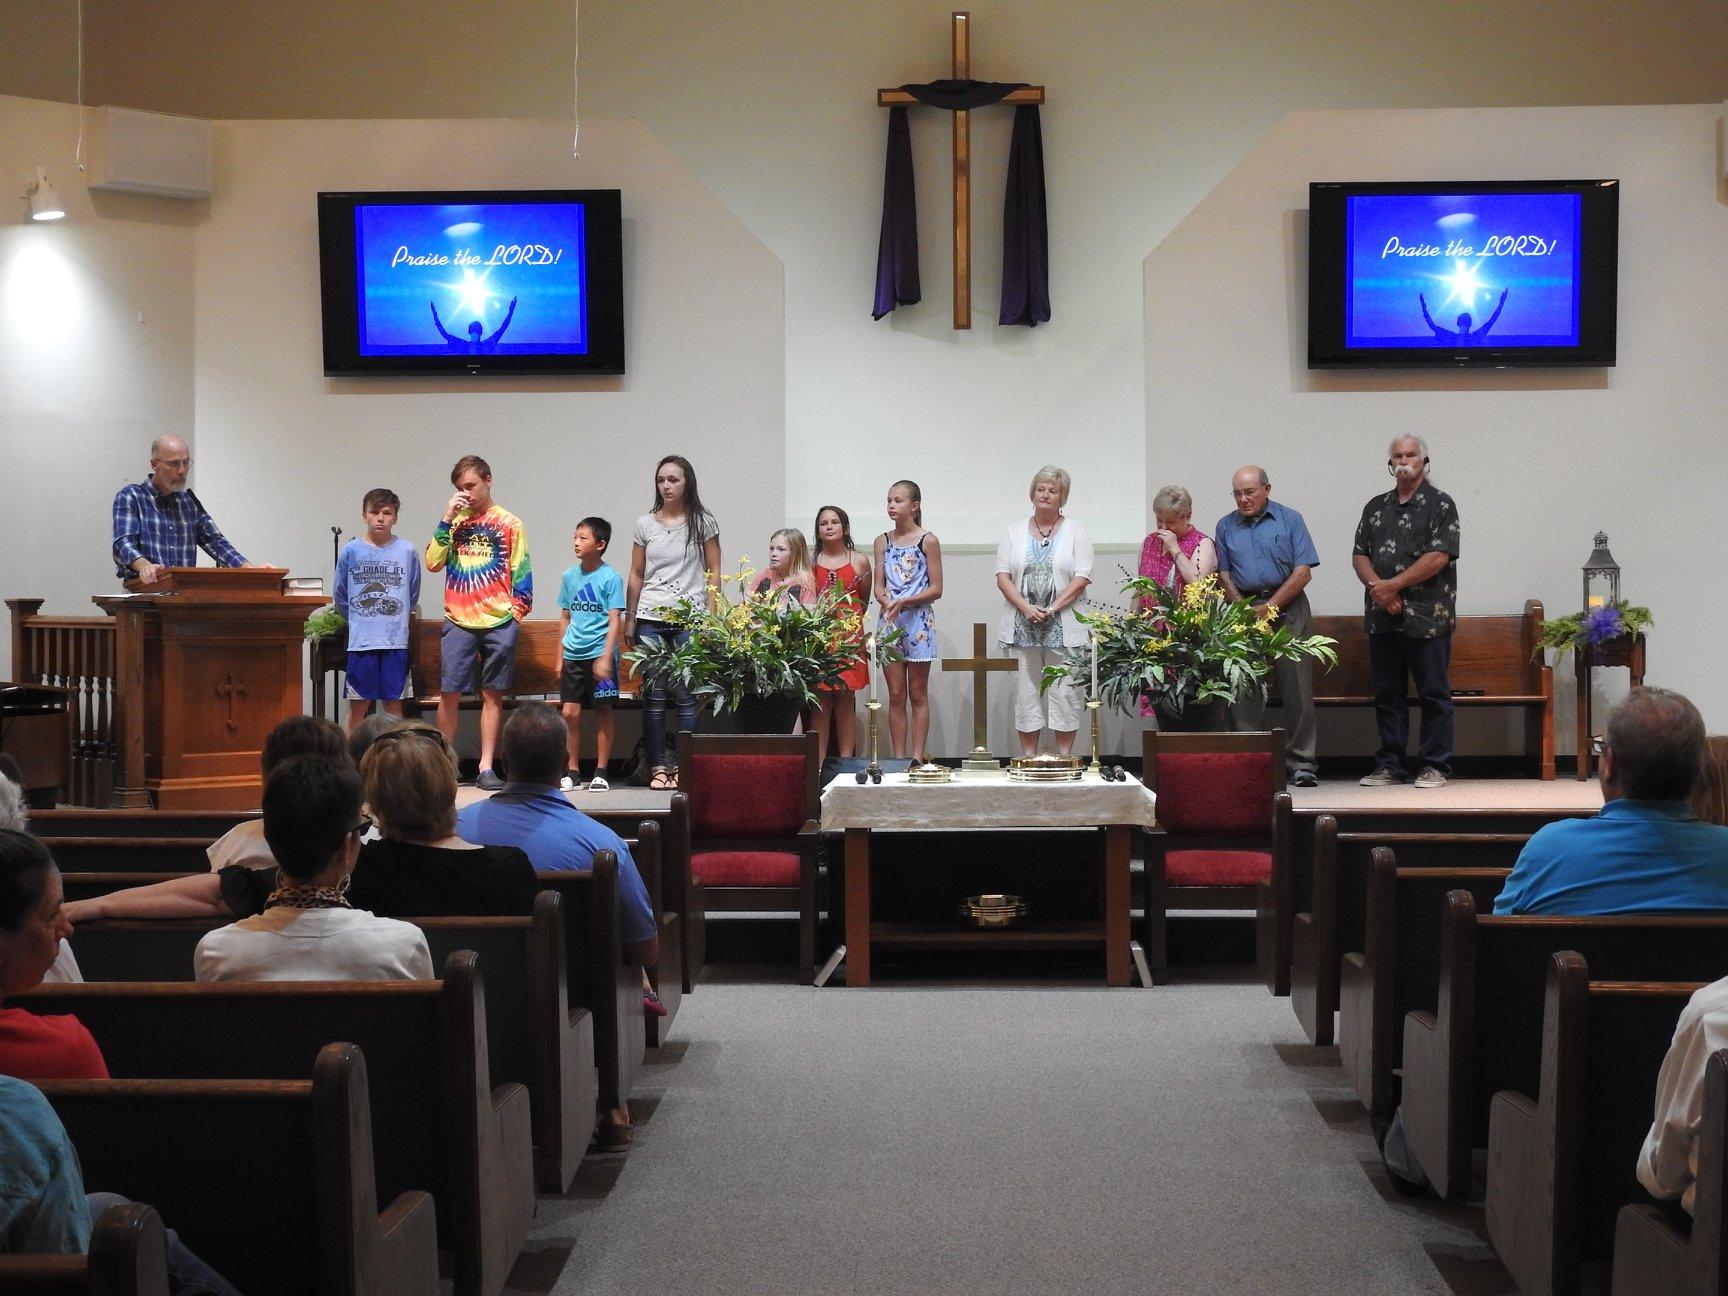 church service in girard illinois